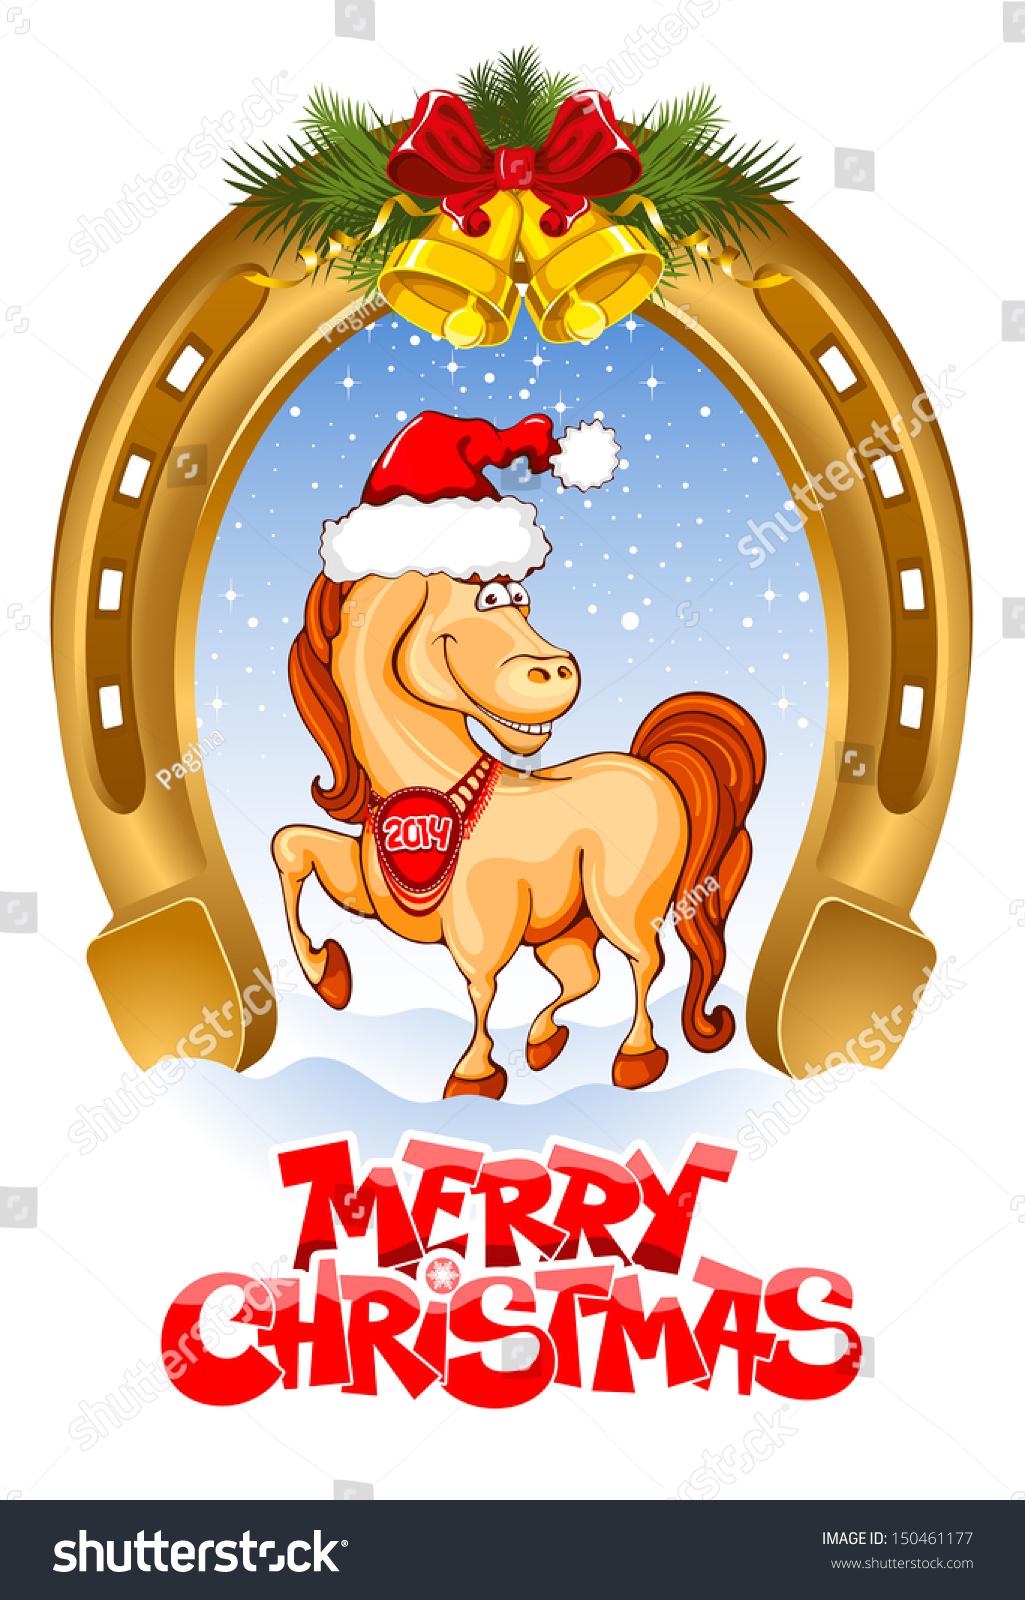 Merry Christmas 2014 Clip Art